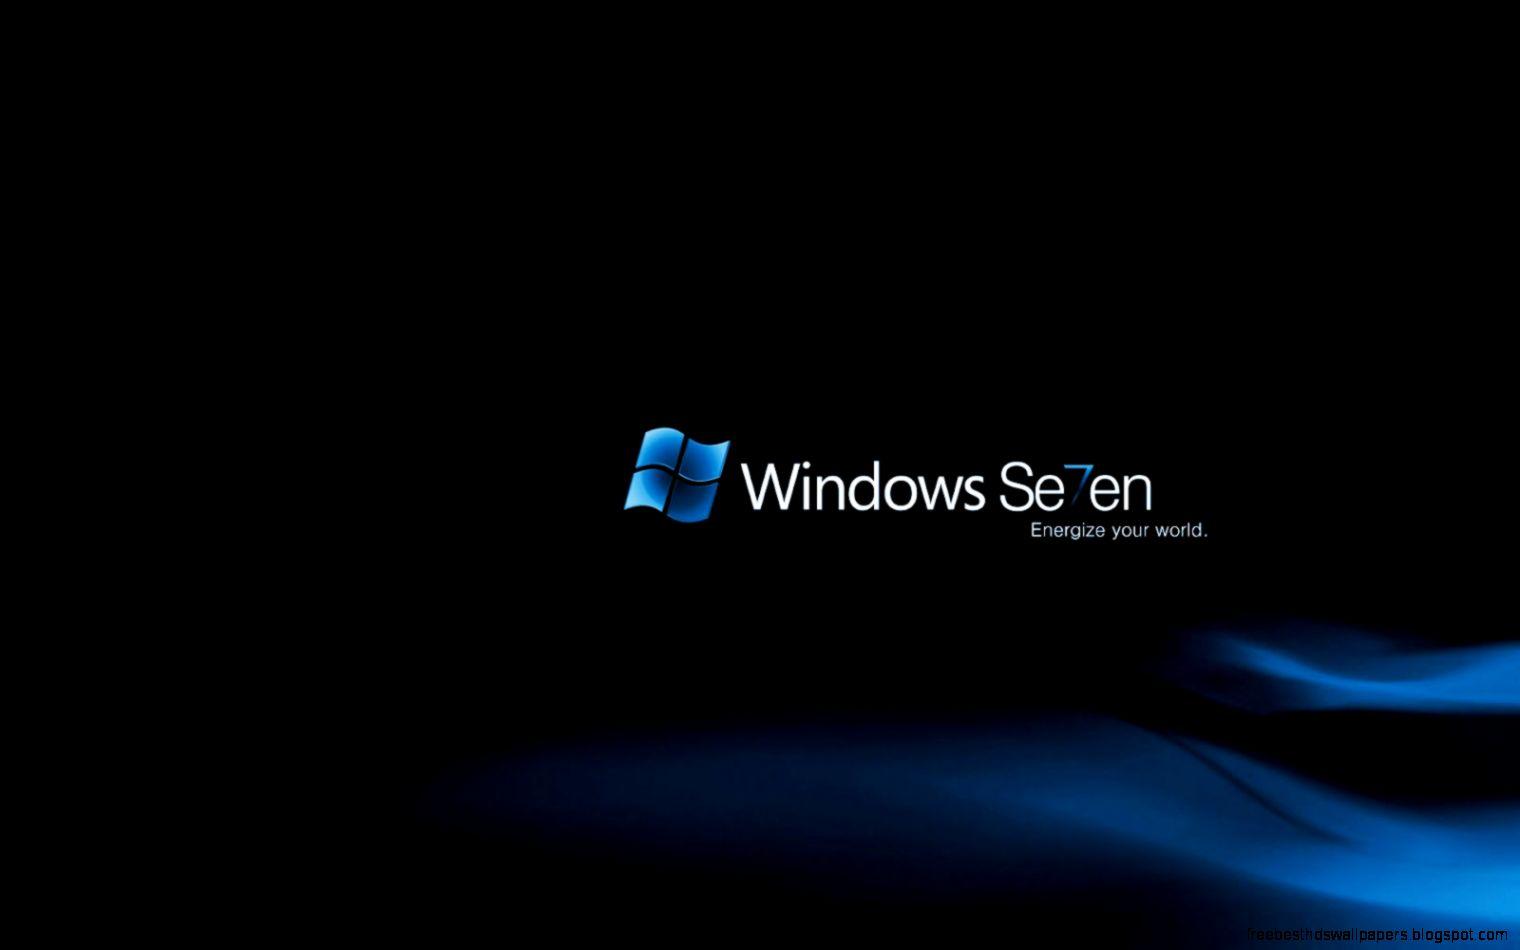 how to install live desktop wallpaper windows 8